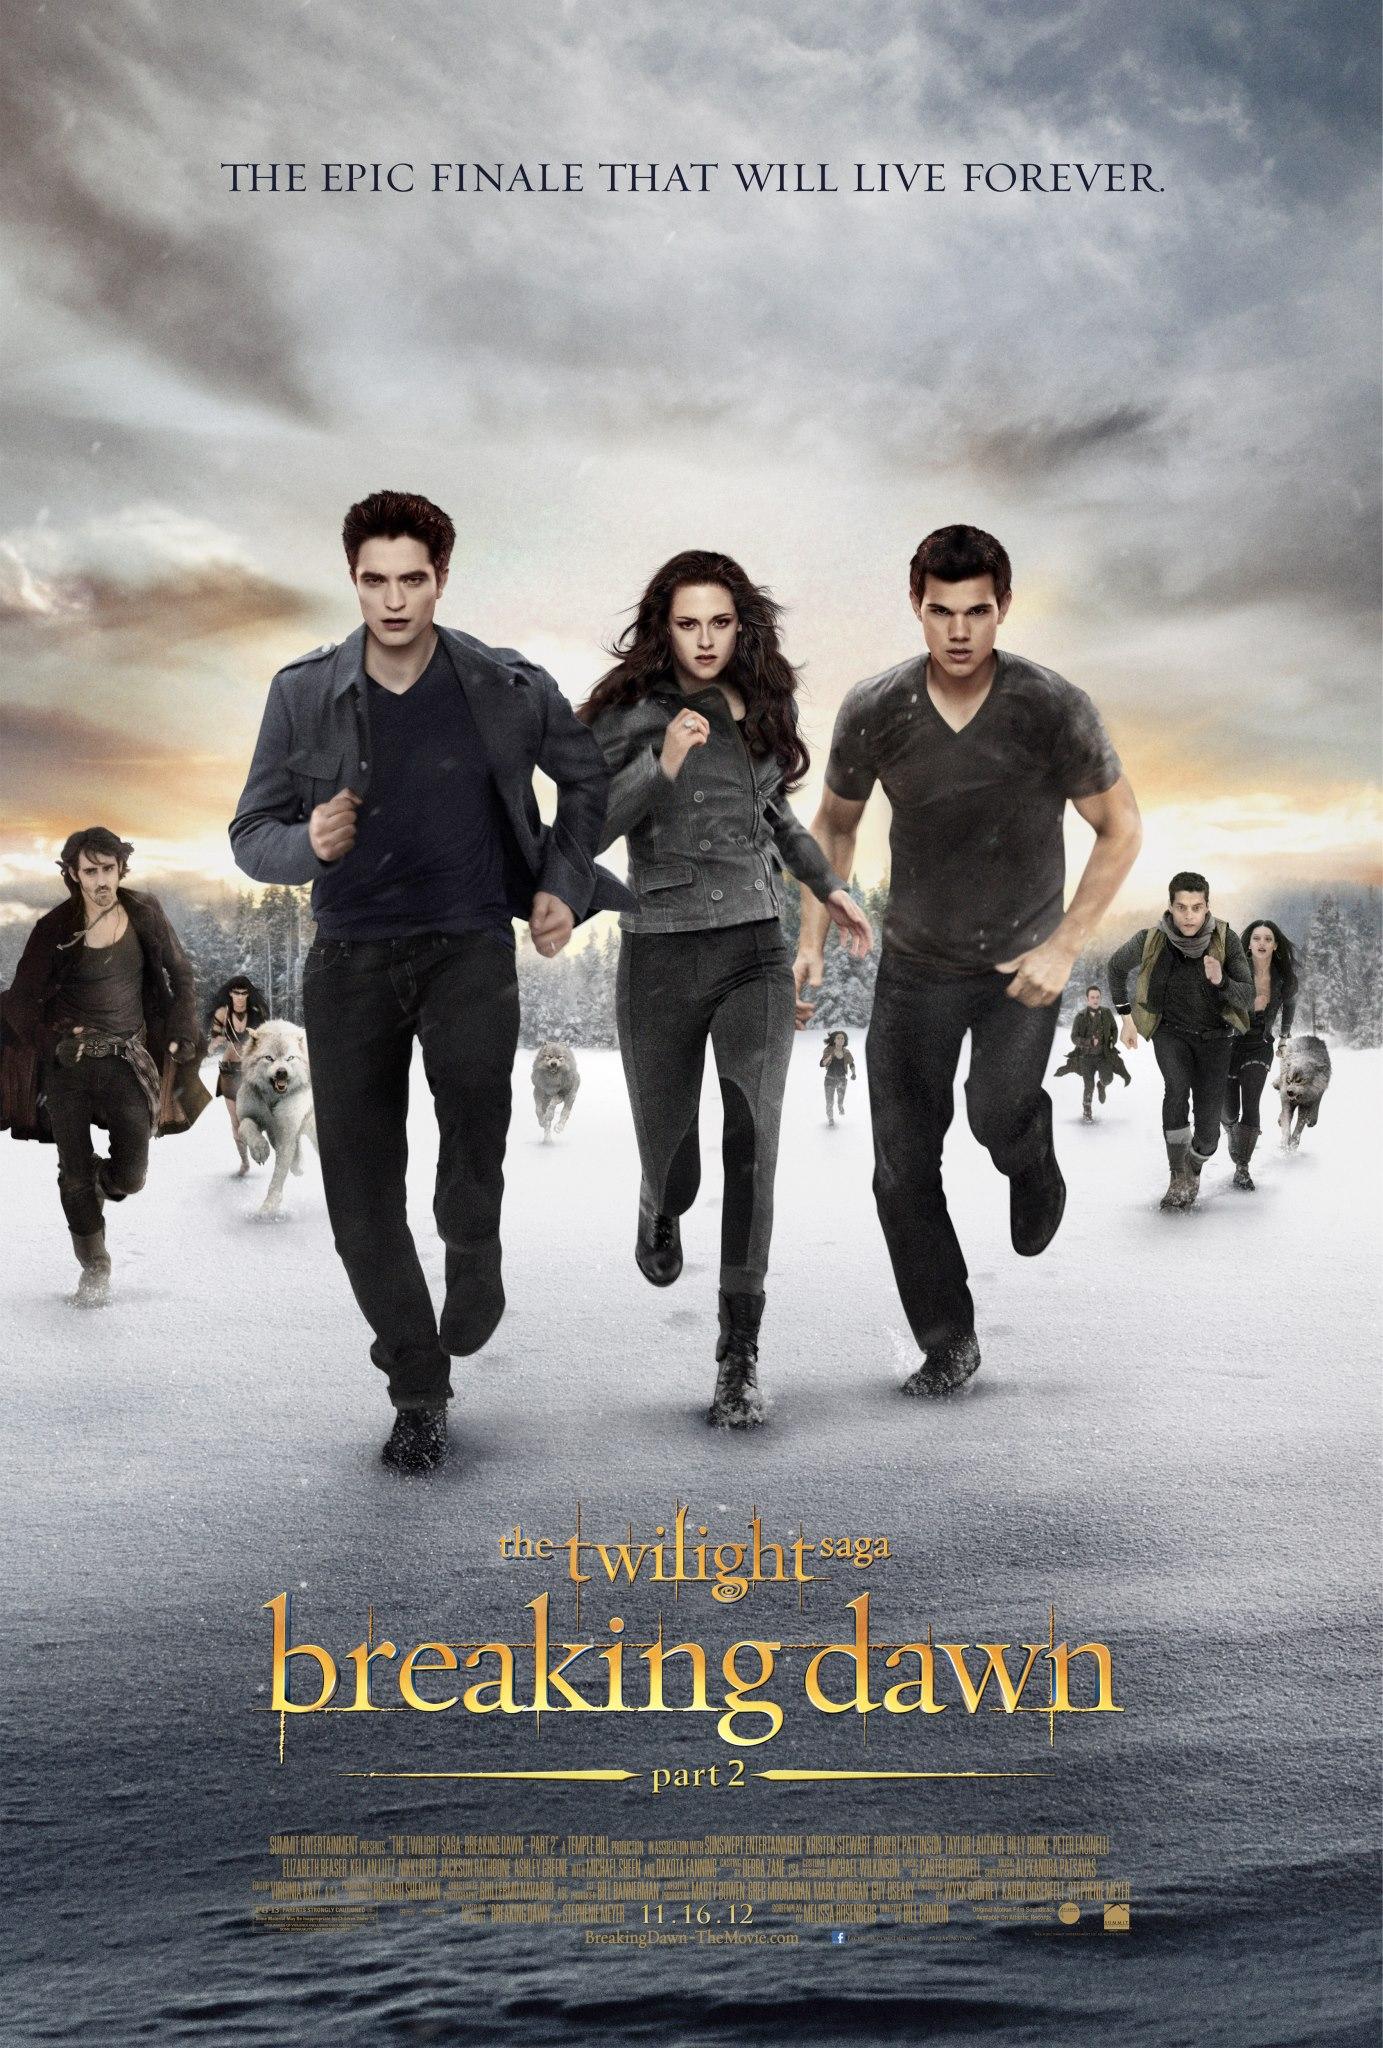 The Twilight Saga: Breaking Dawn Part 2 Poster